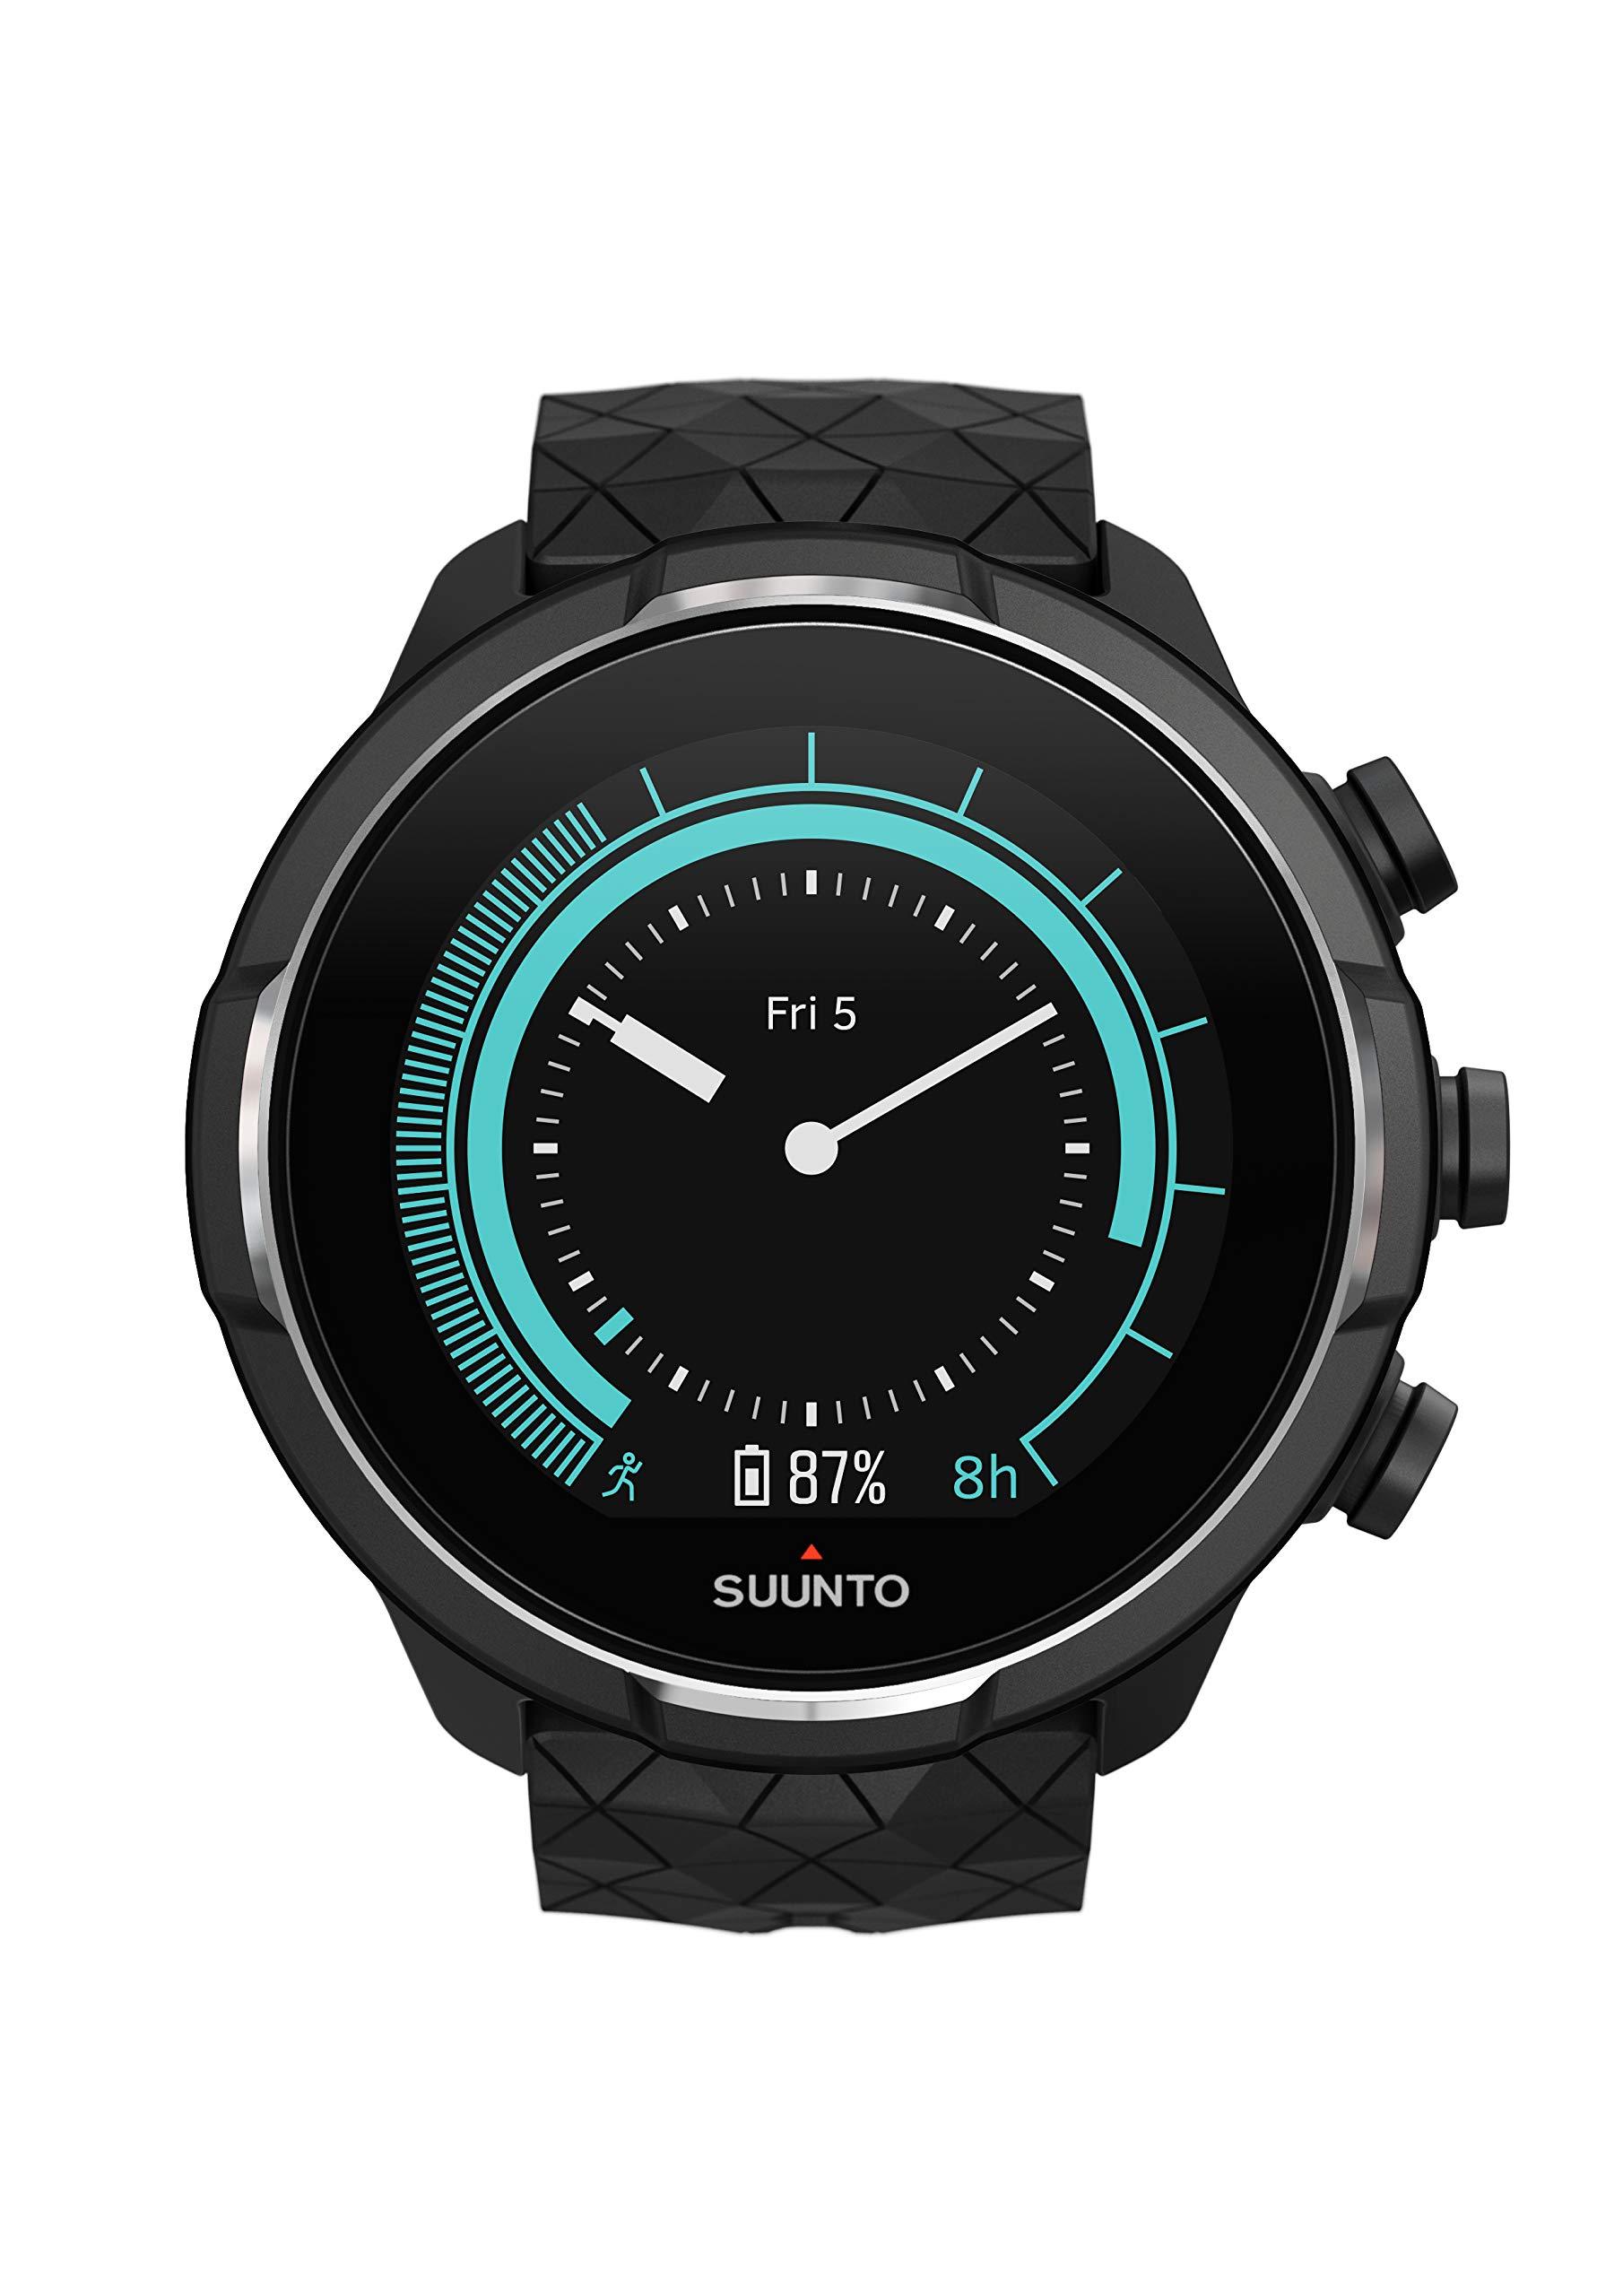 Suunto 9 Multisport GPS Watch with BARO and Wrist-Based Heart Rate (Titanium)